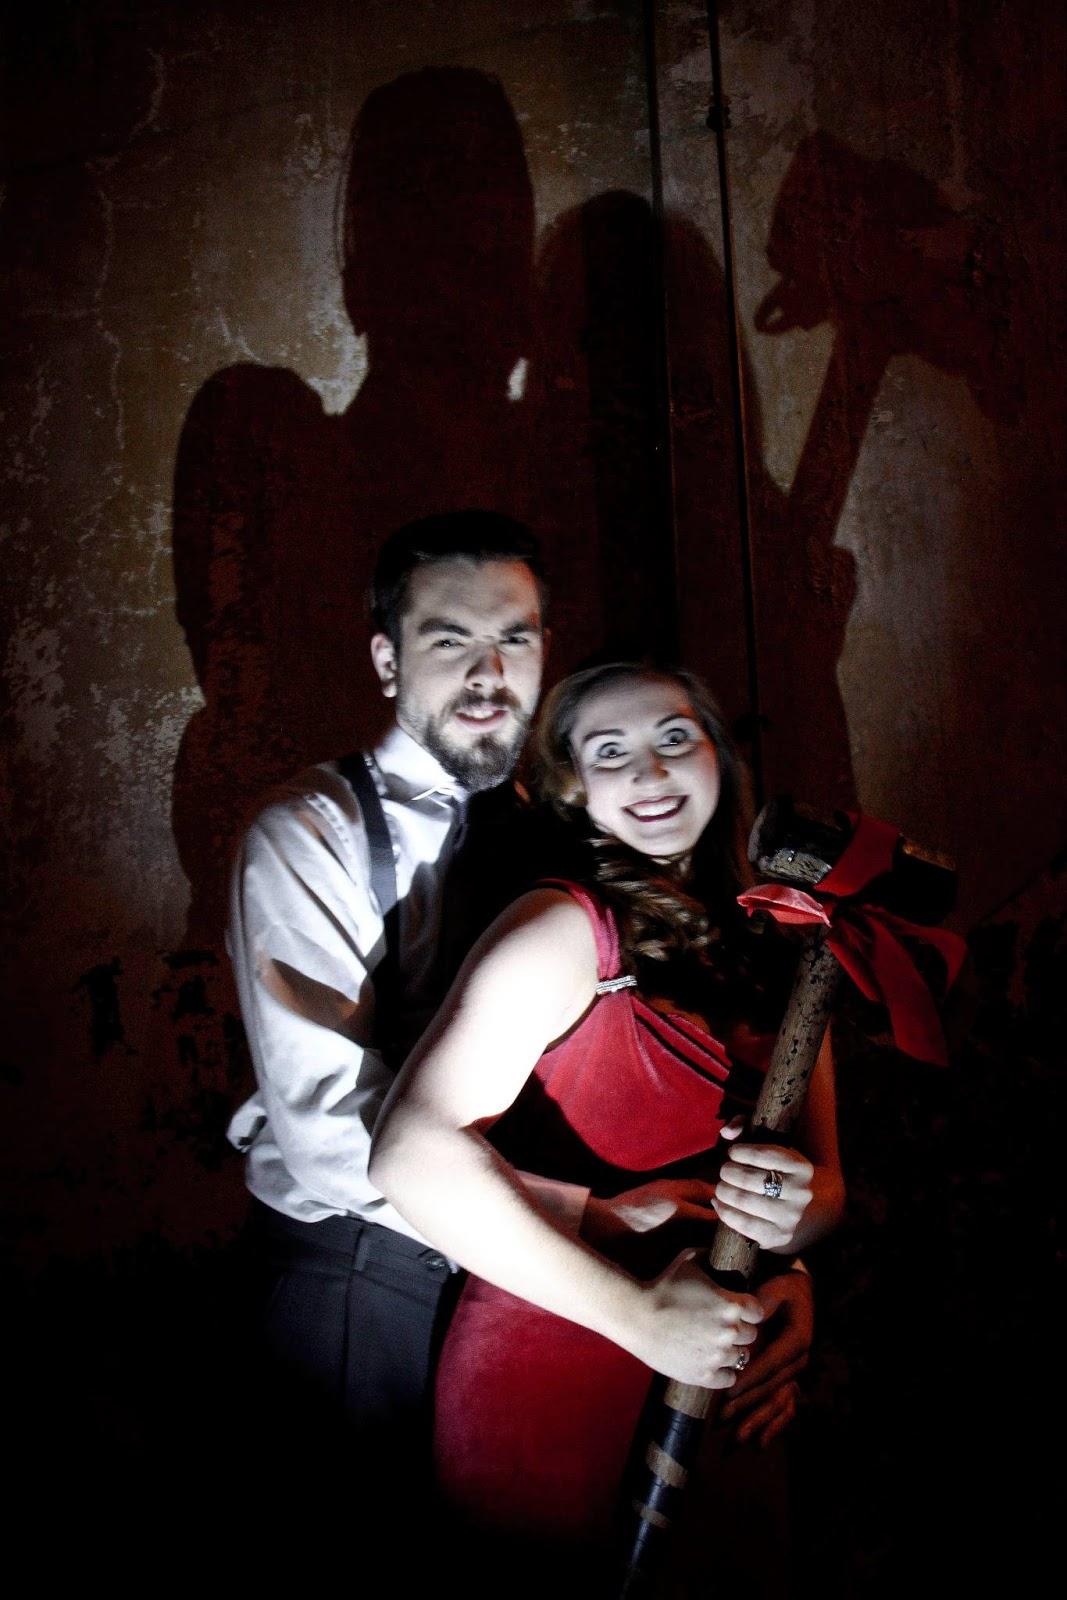 broken hearts in the basement scarehouse etna pa